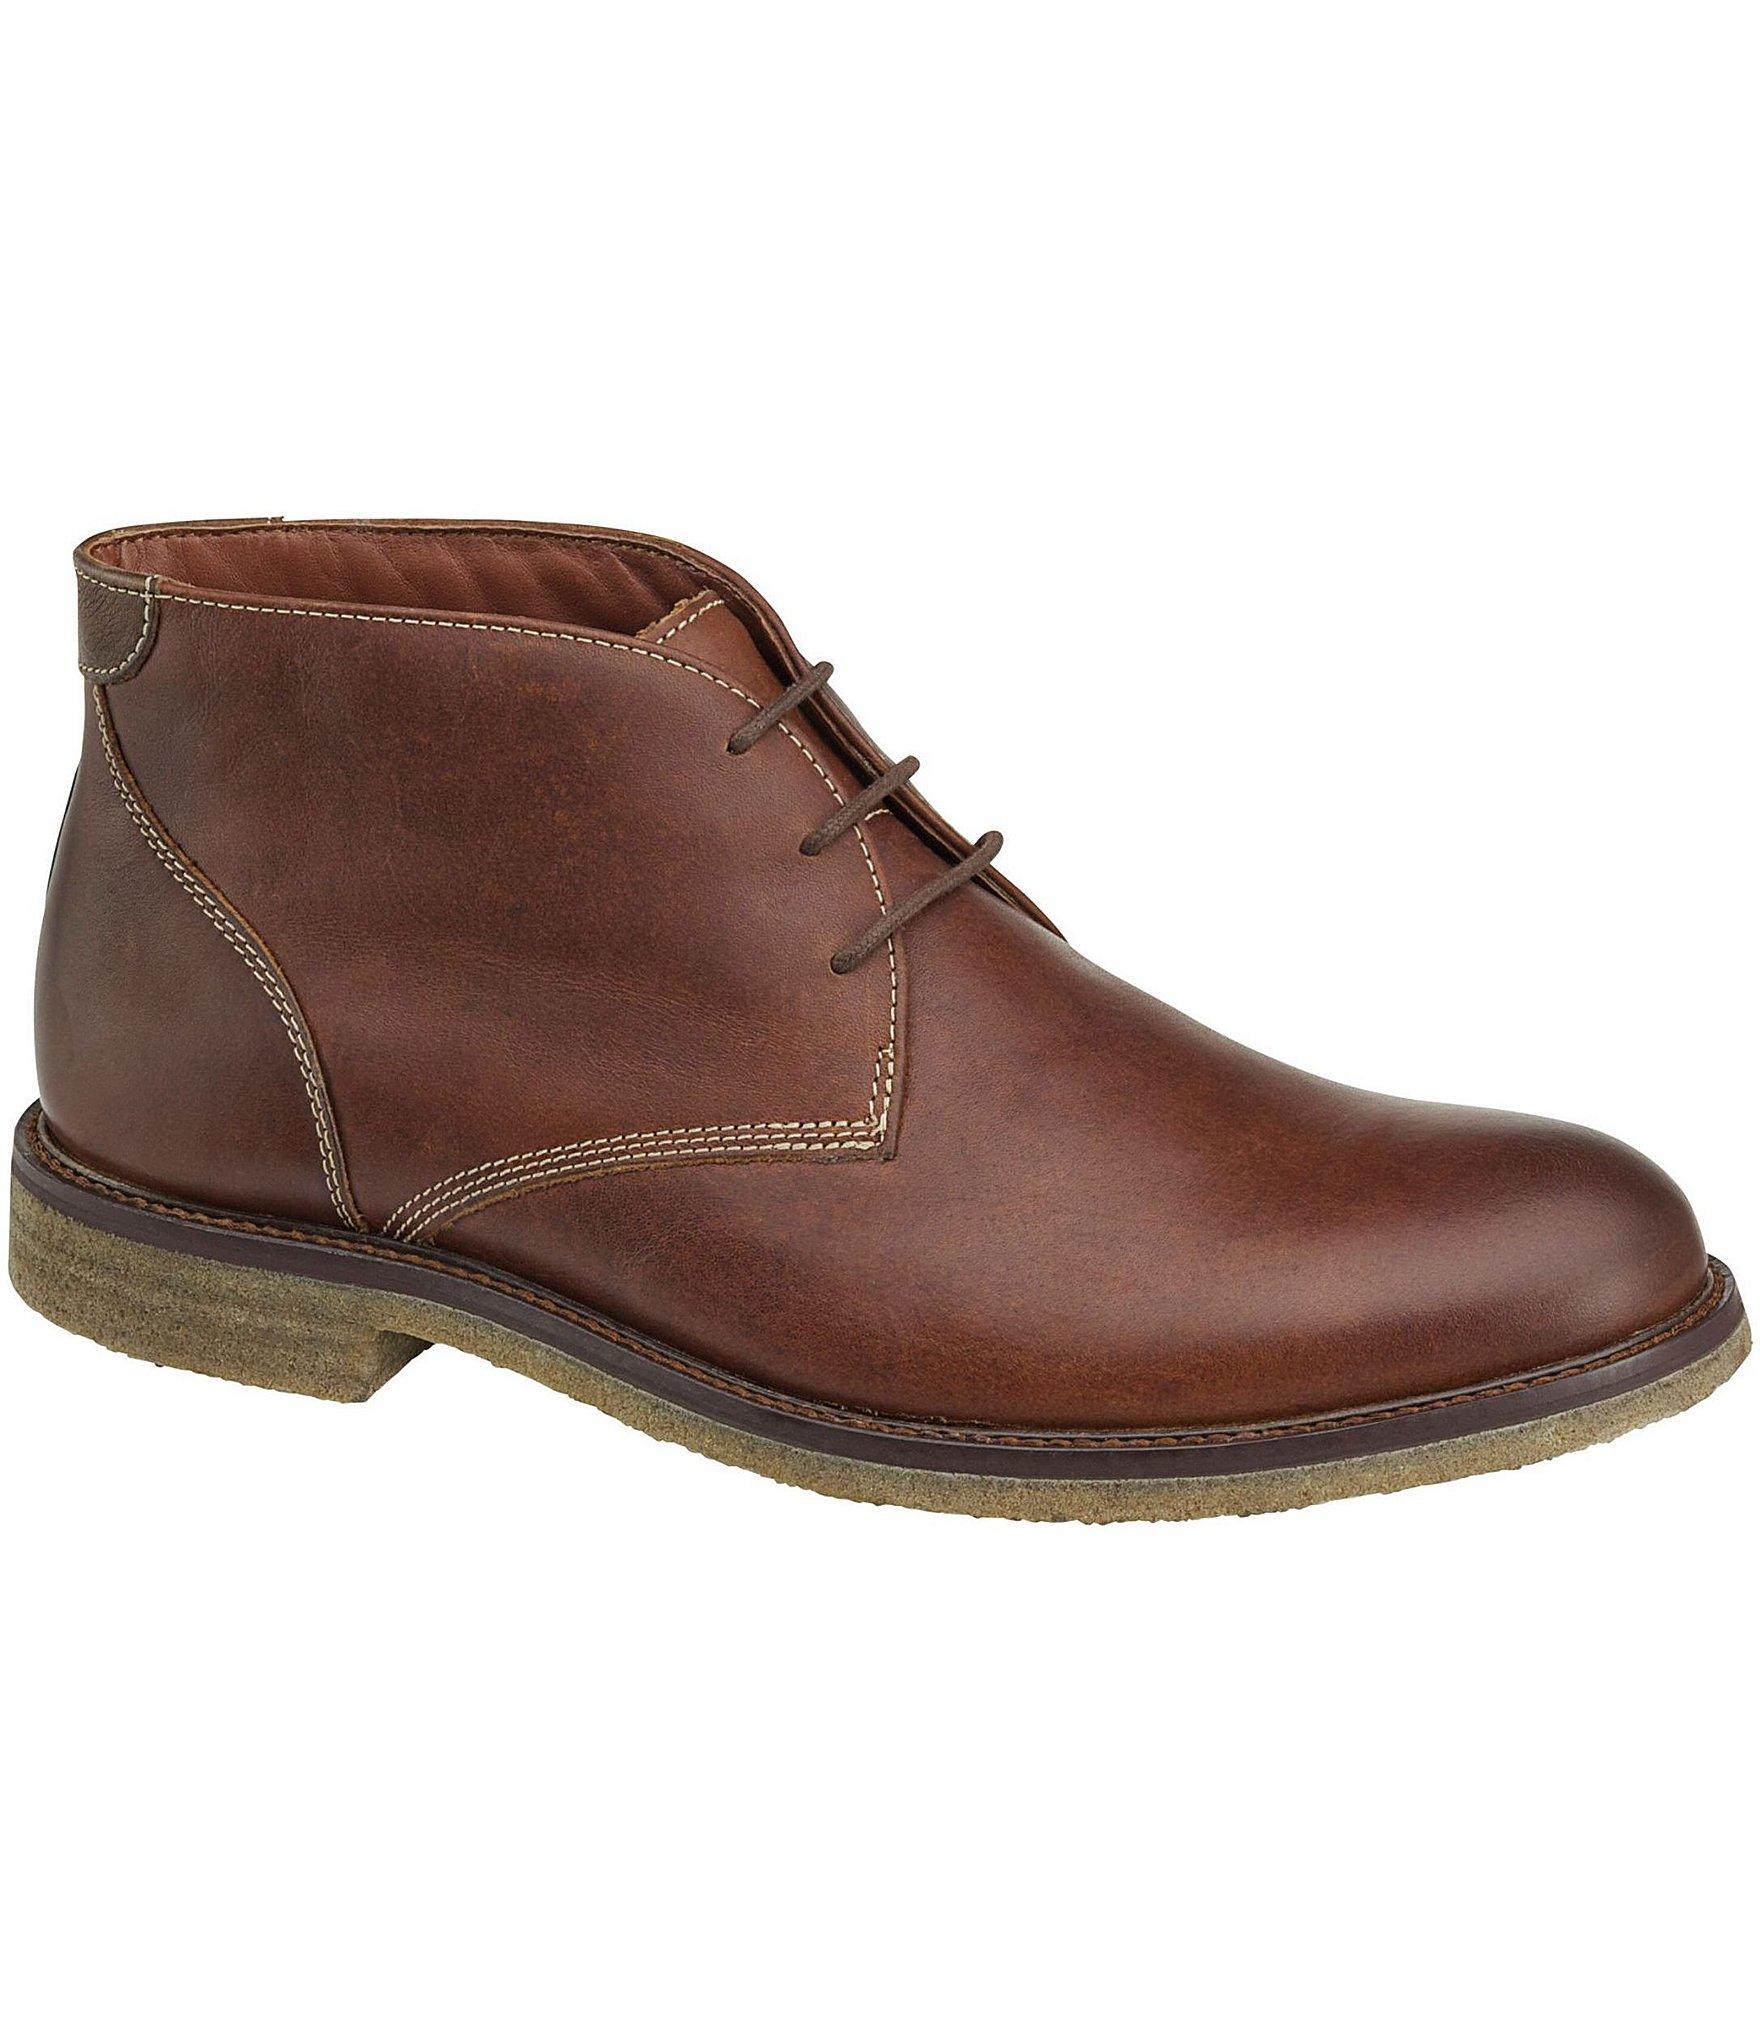 johnston murphy s copeland chukka boots in brown